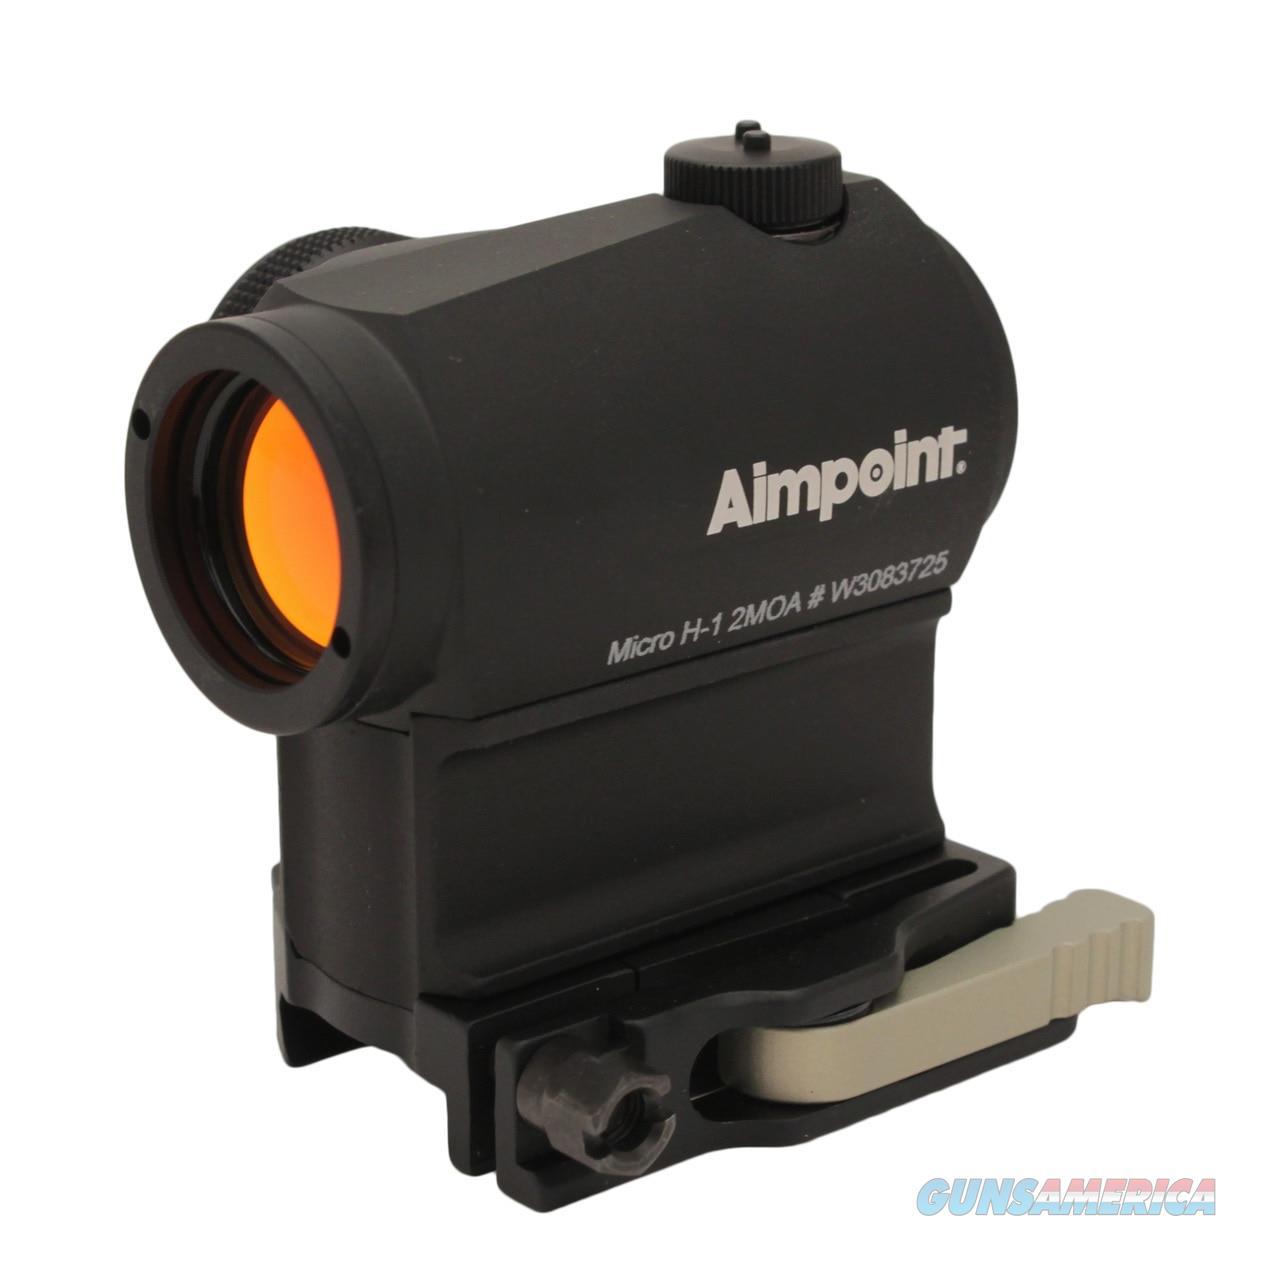 Aimpoint Micro 200158  Non-Guns > Iron/Metal/Peep Sights